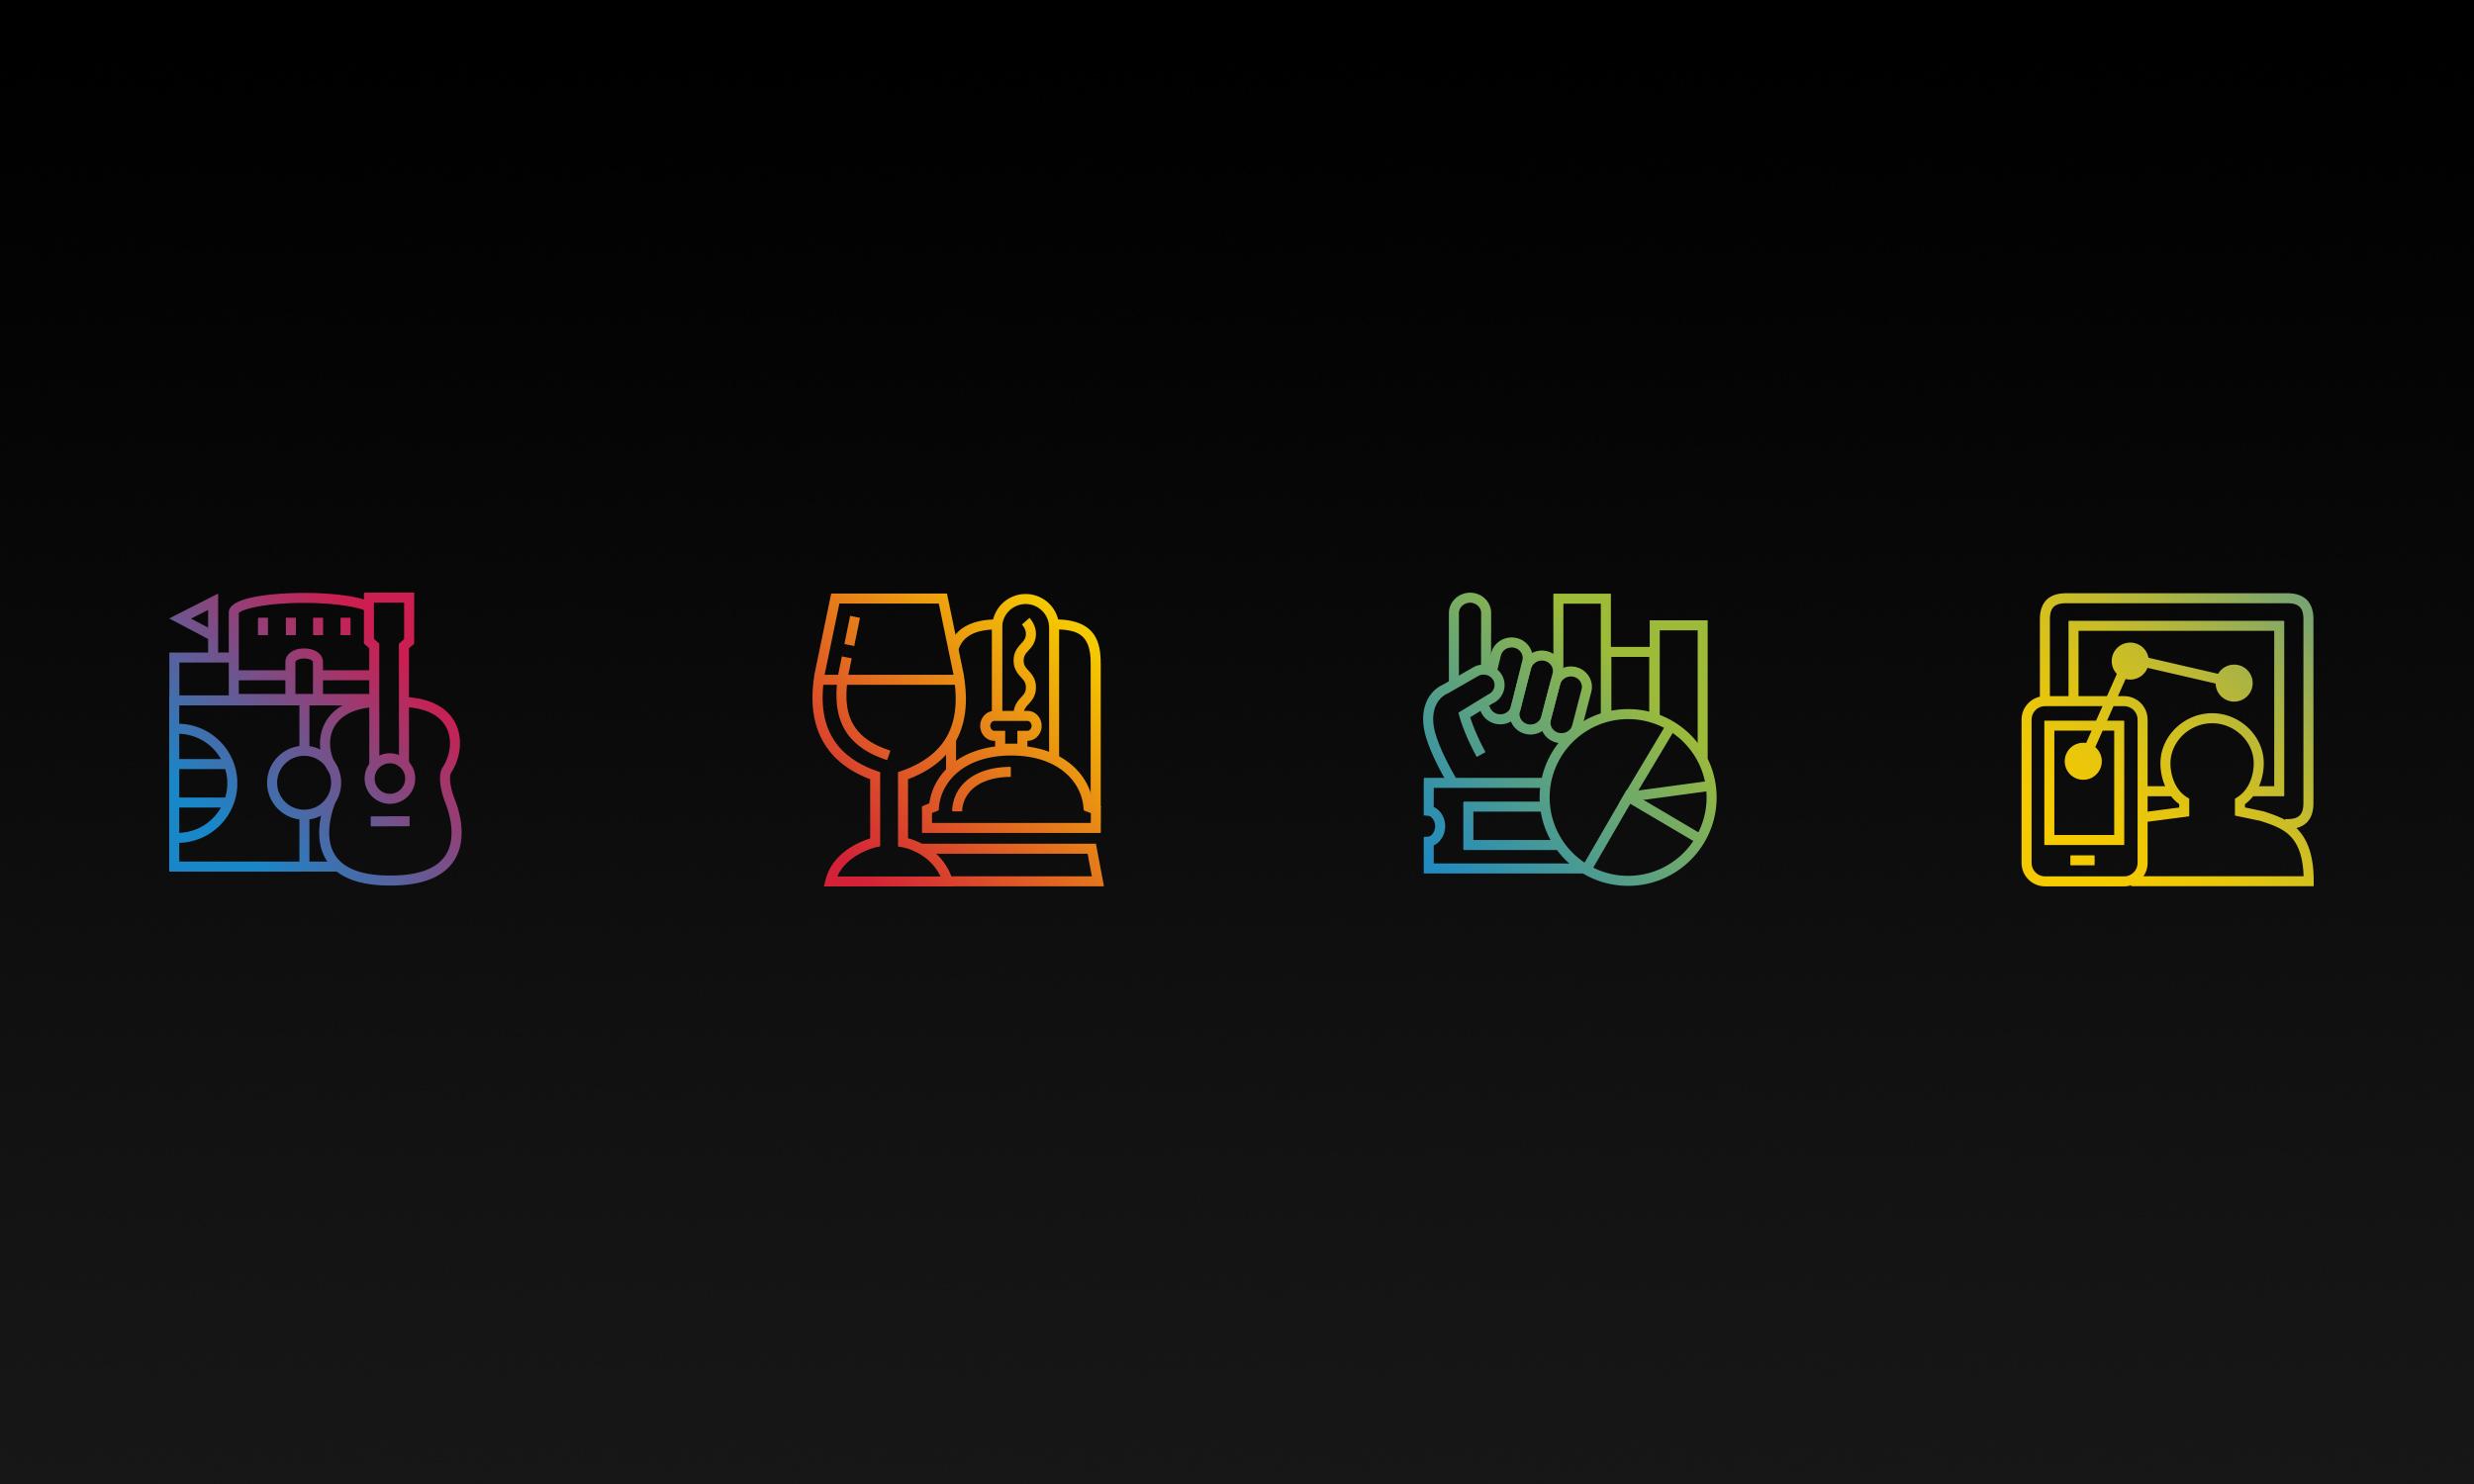 Spectra_Icons.jpg